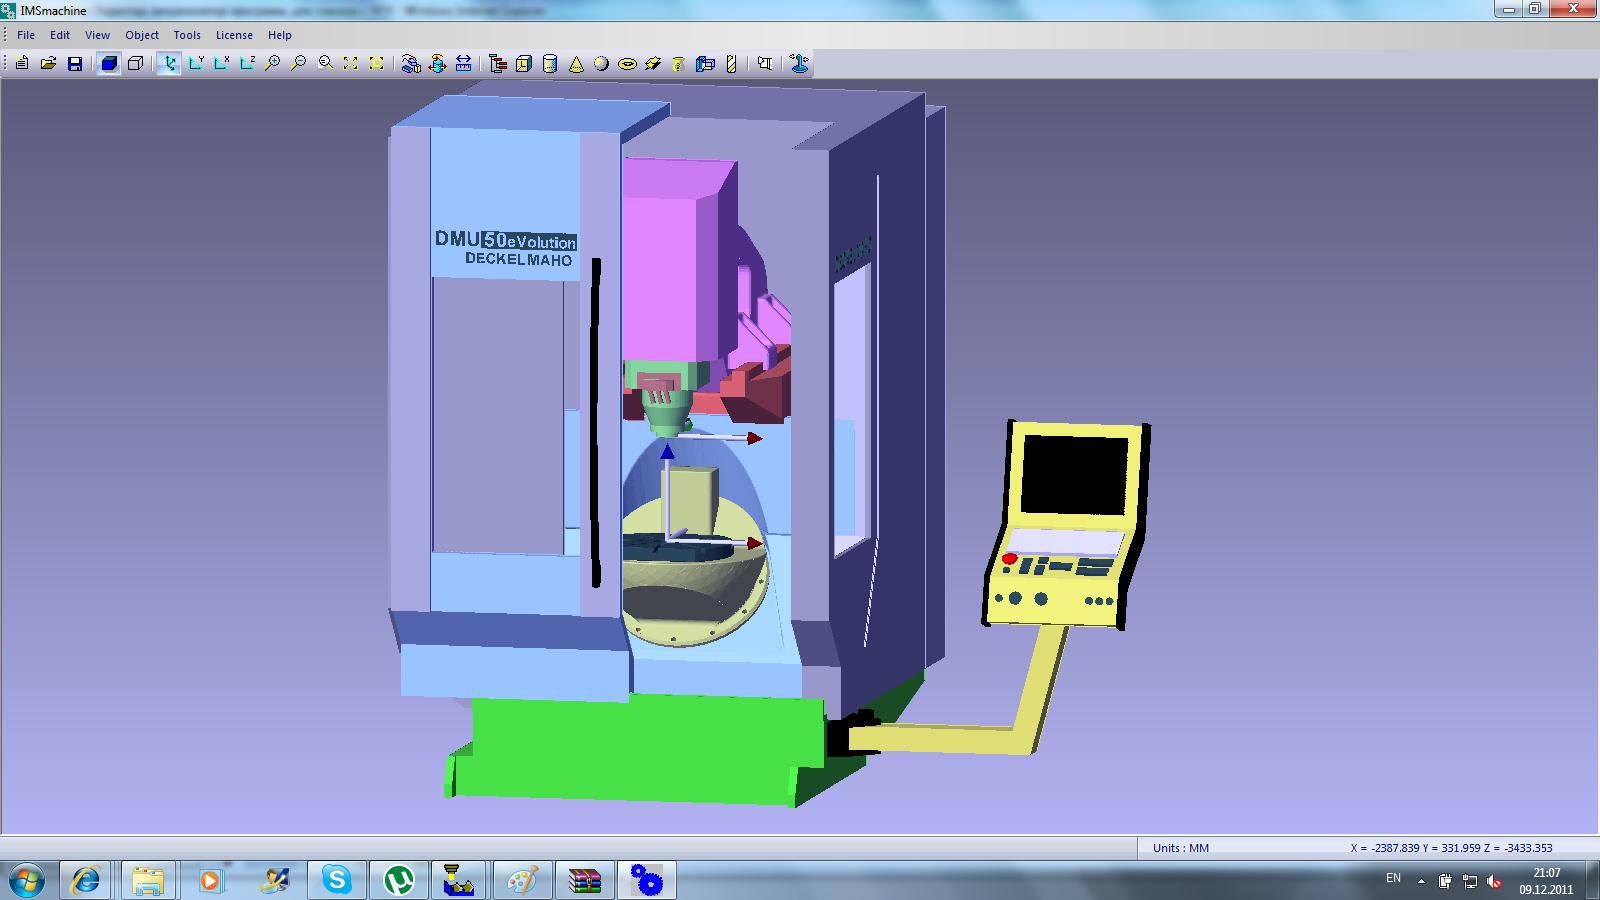 Simulation with IMSverify 2010 v4.3 machine